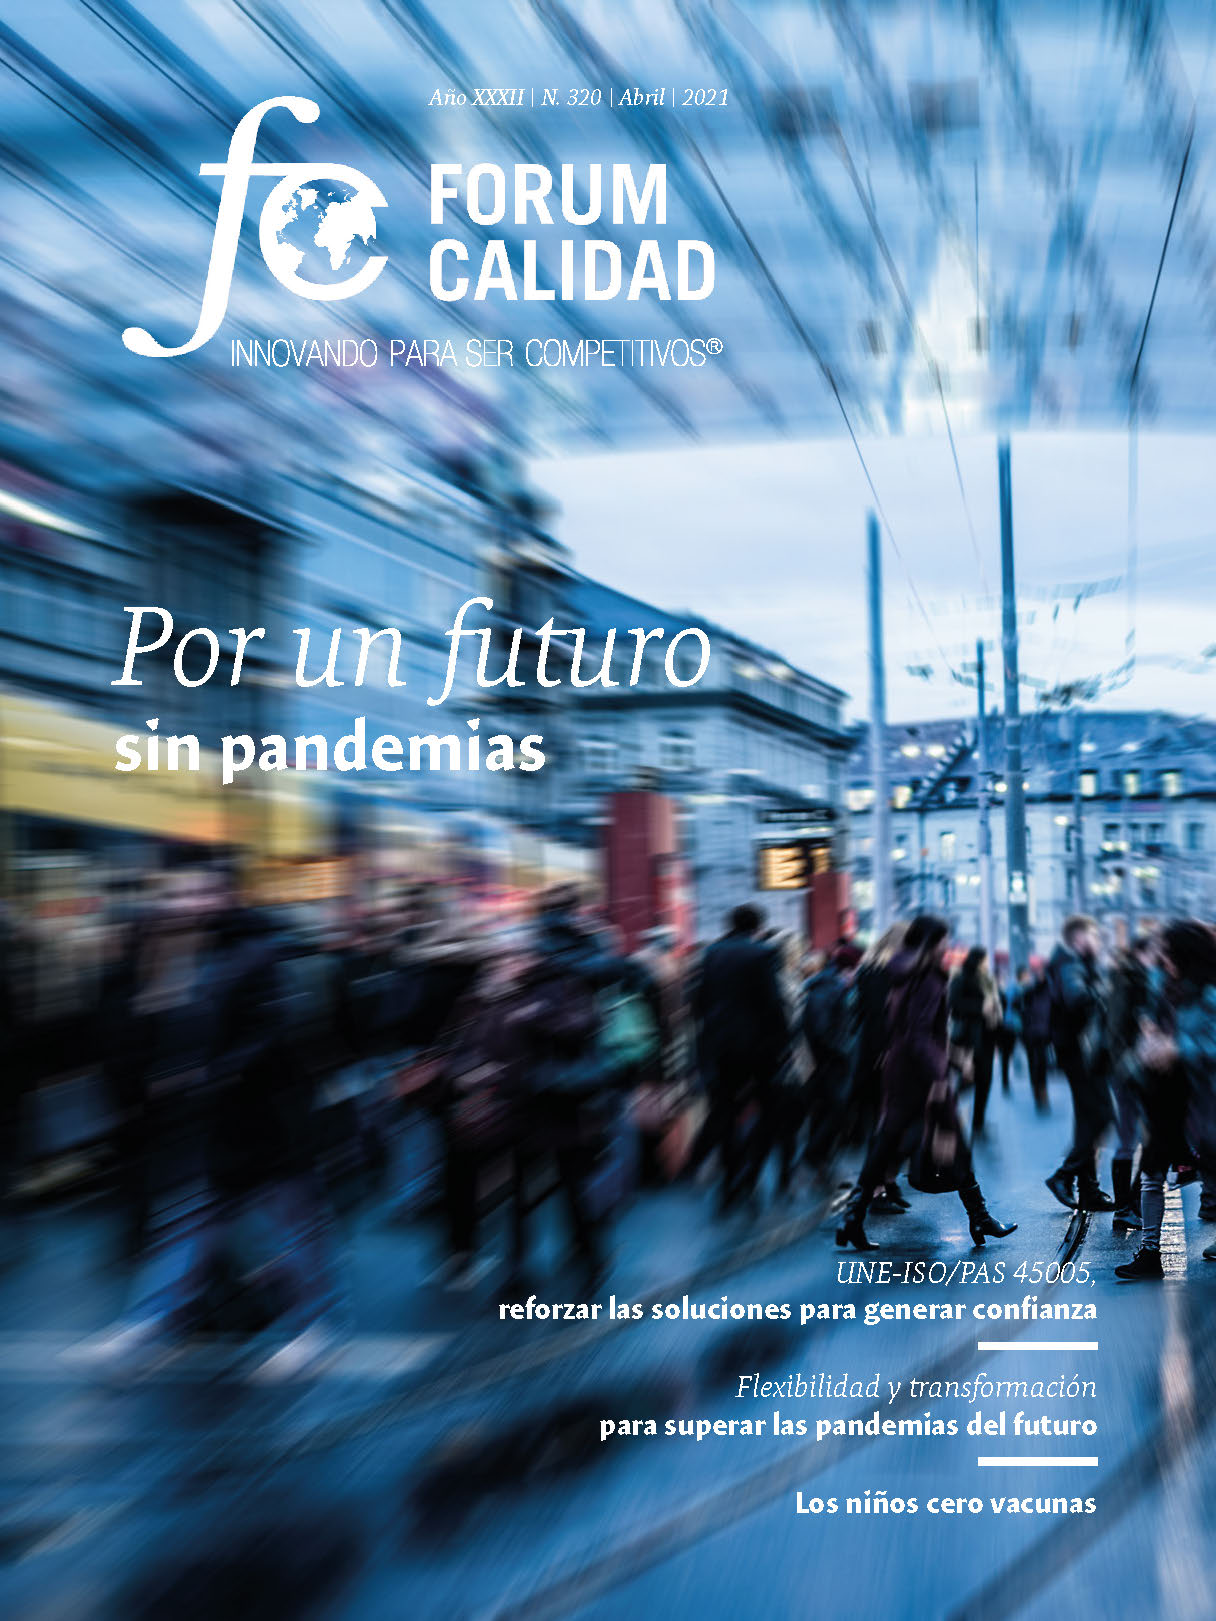 Forum Calidad nº 320 Abril 2021